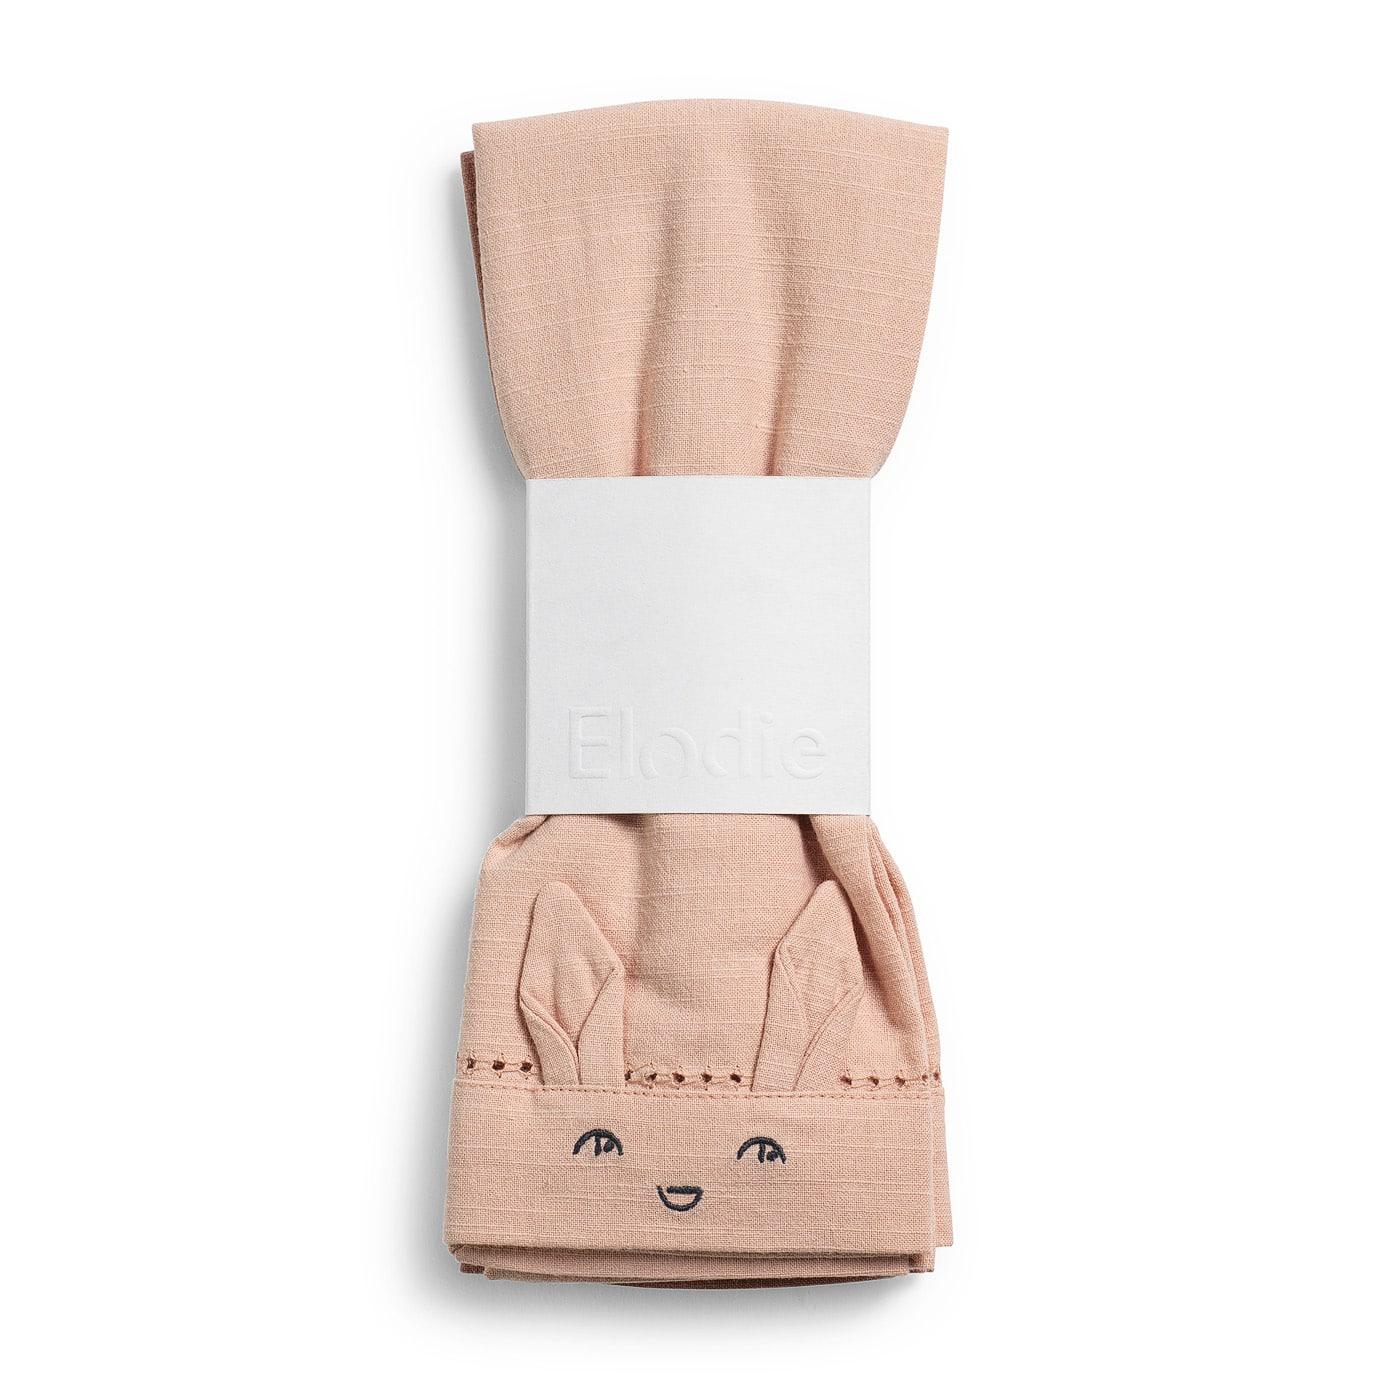 ELODIE DETAILS Πετσέτες Φαγητού Elodie Details Faded Rose / Powder Pink